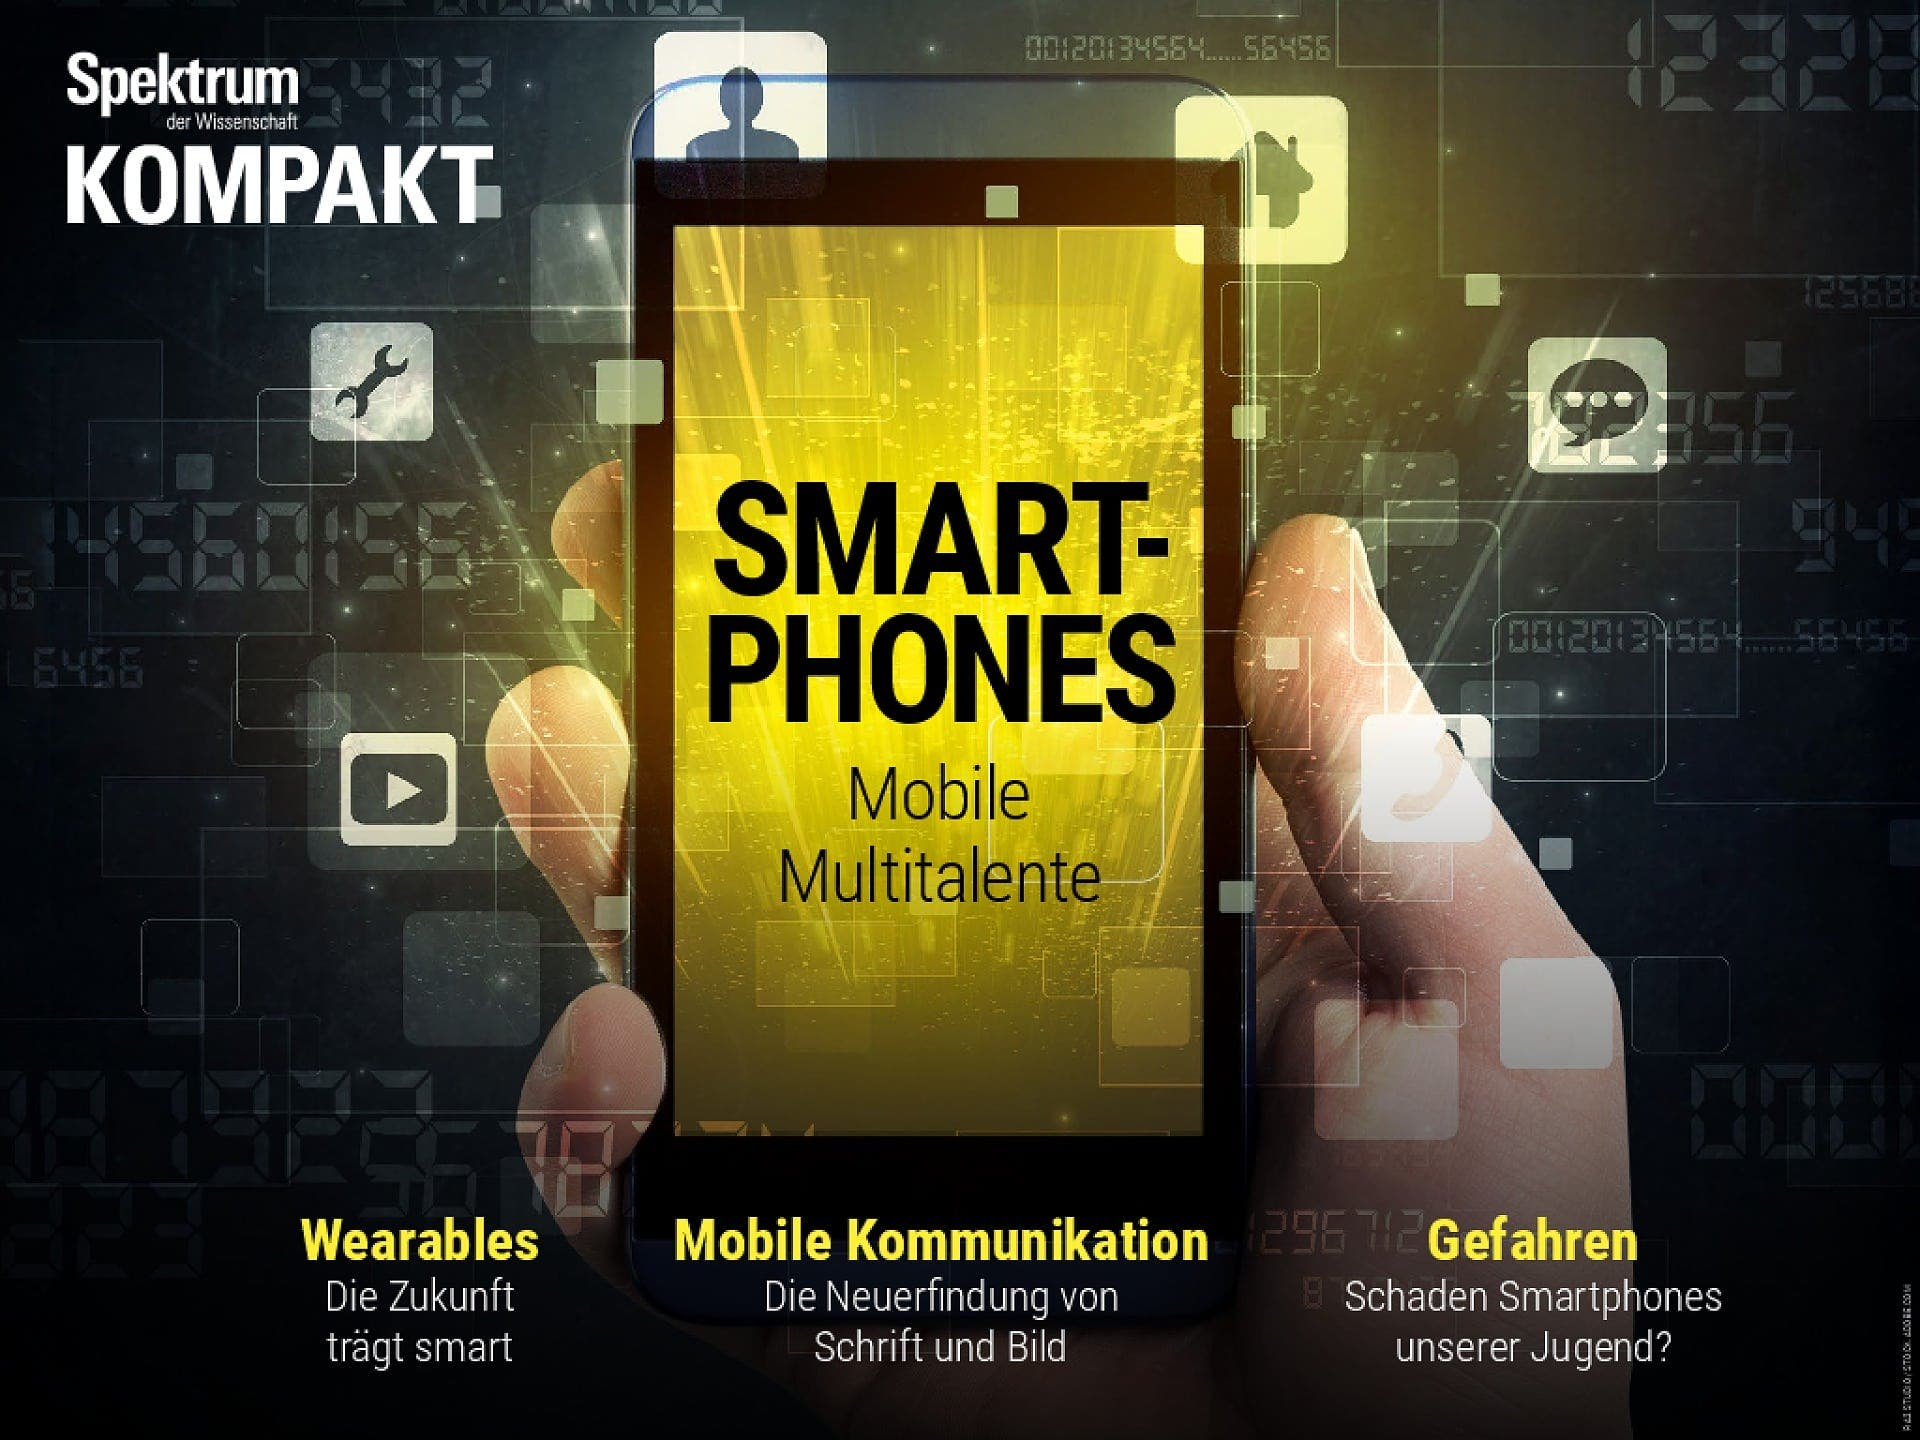 Smartphones - Mobile Multitalente